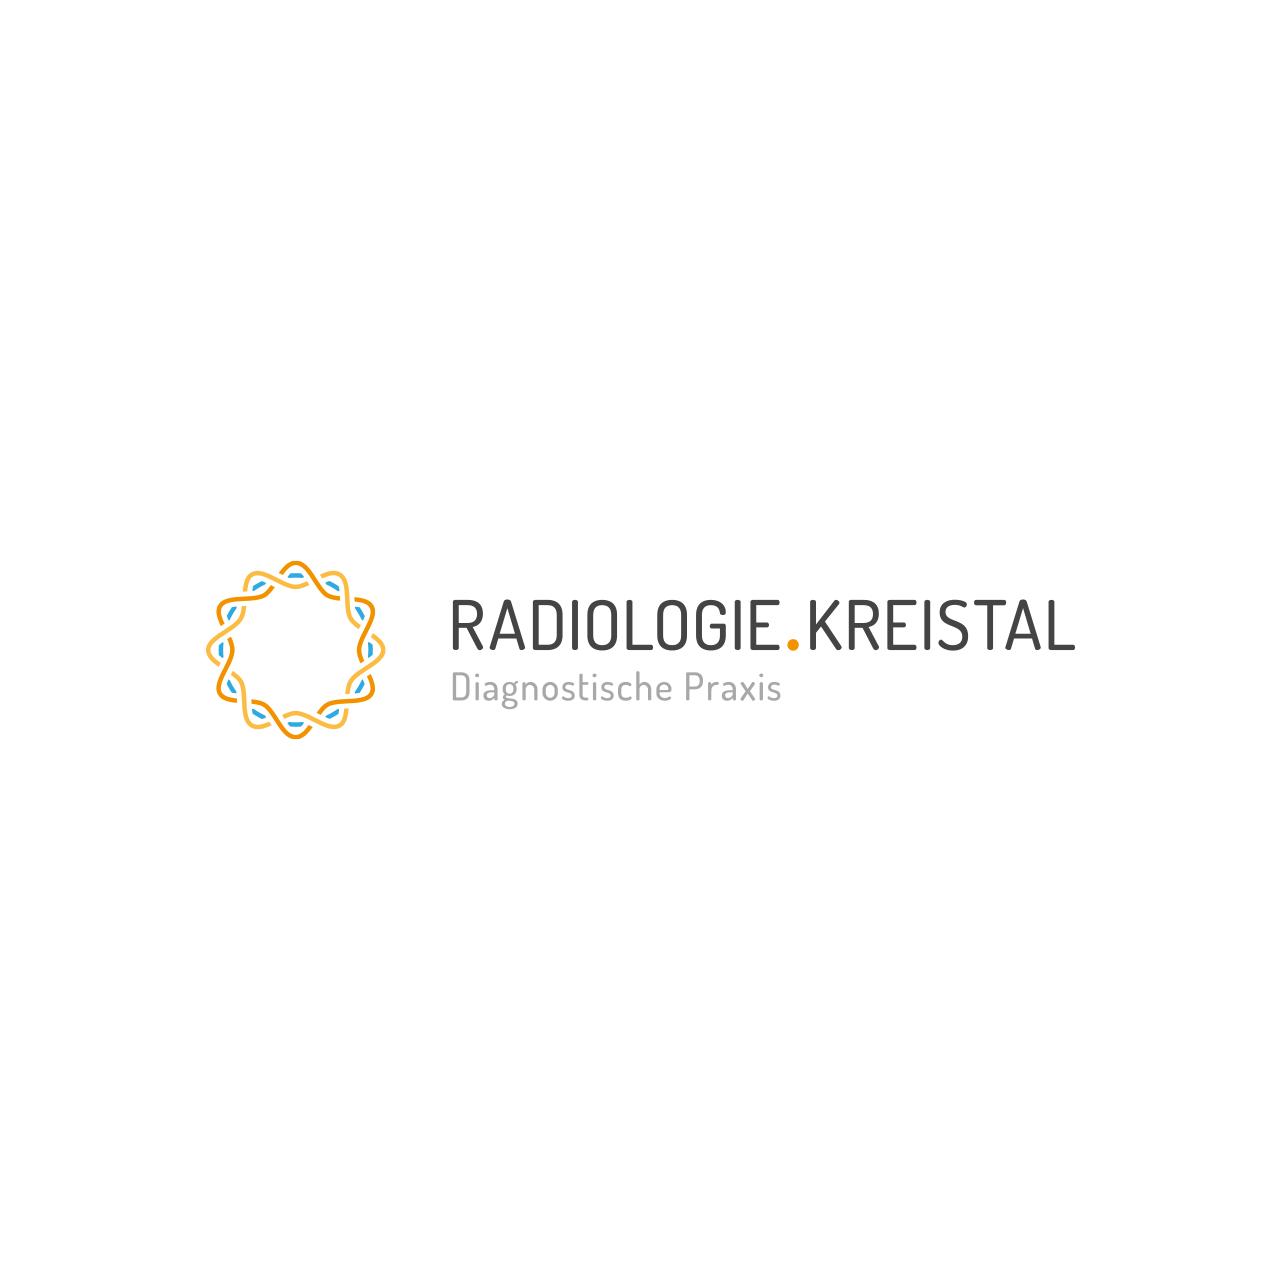 c01-radiologie